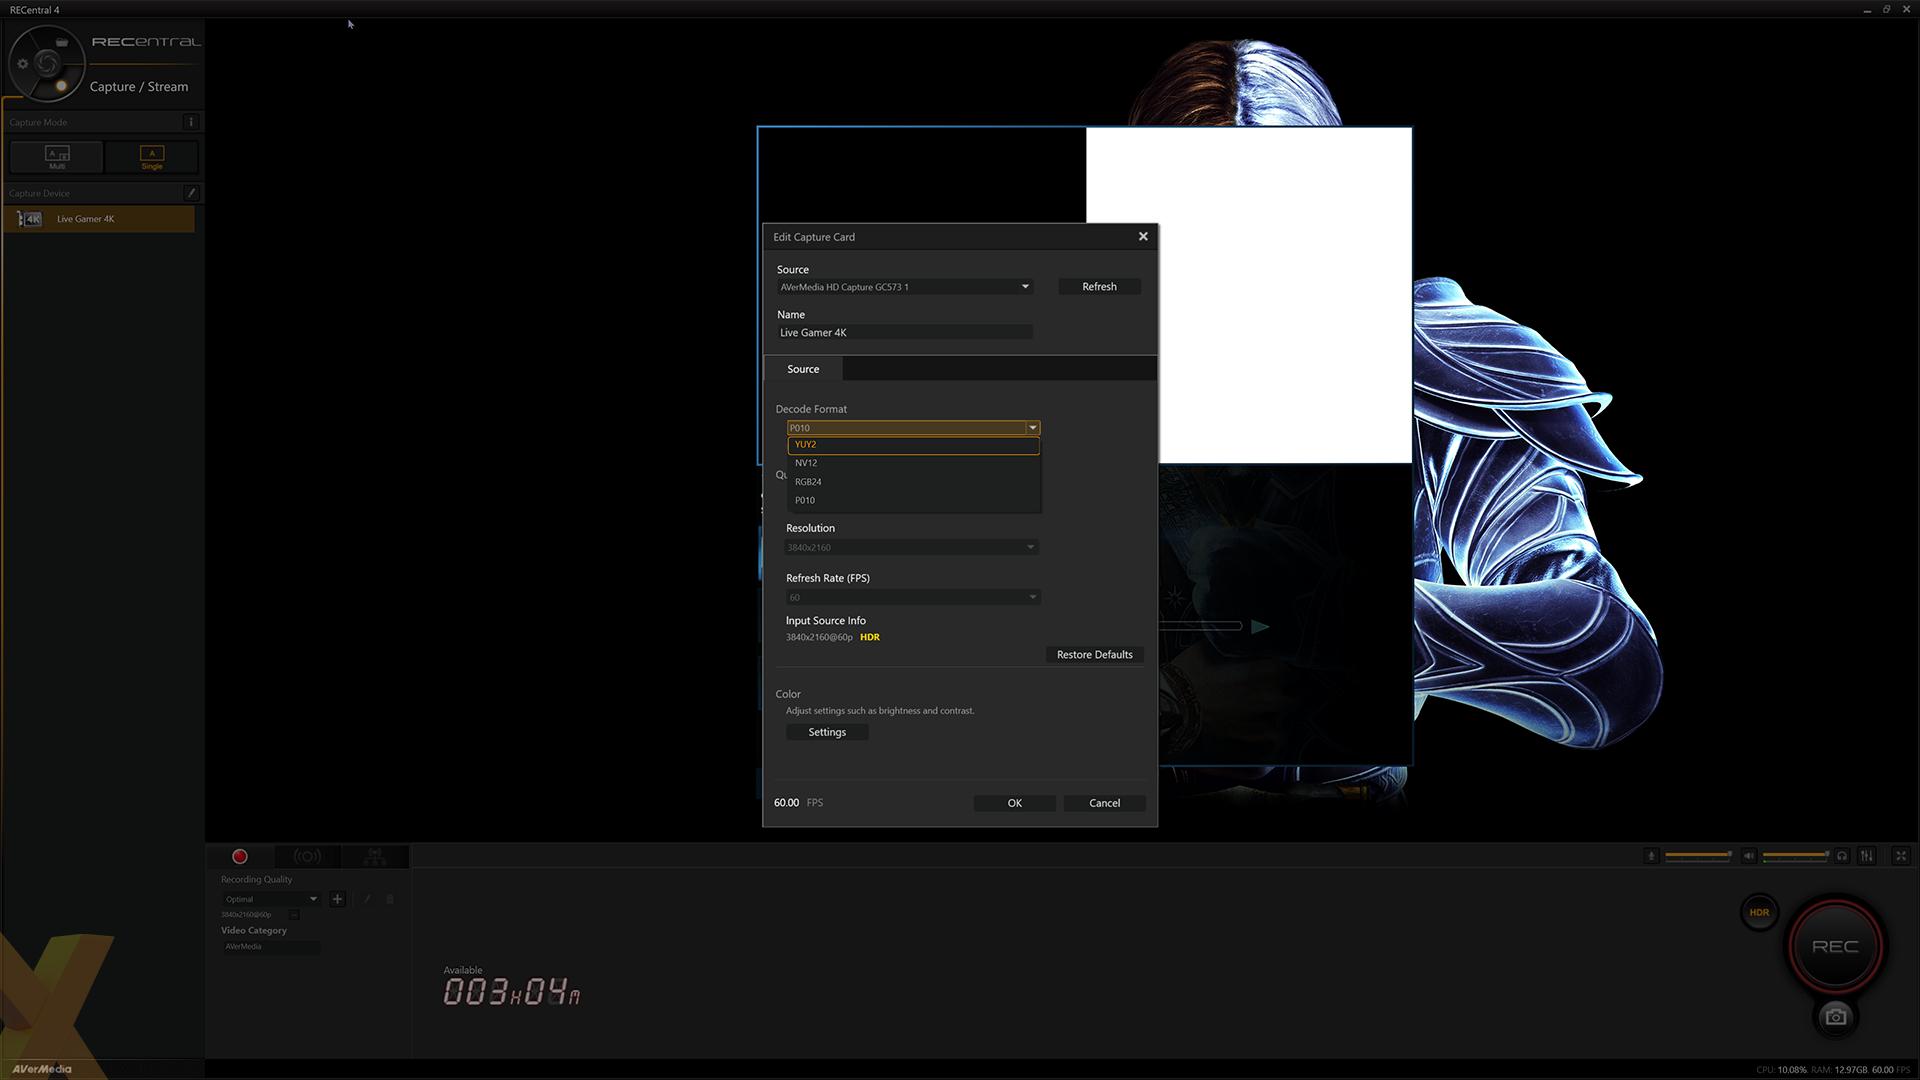 Review: AVerMedia Live Gamer 4K (GC573) - Peripherals - HEXUS net